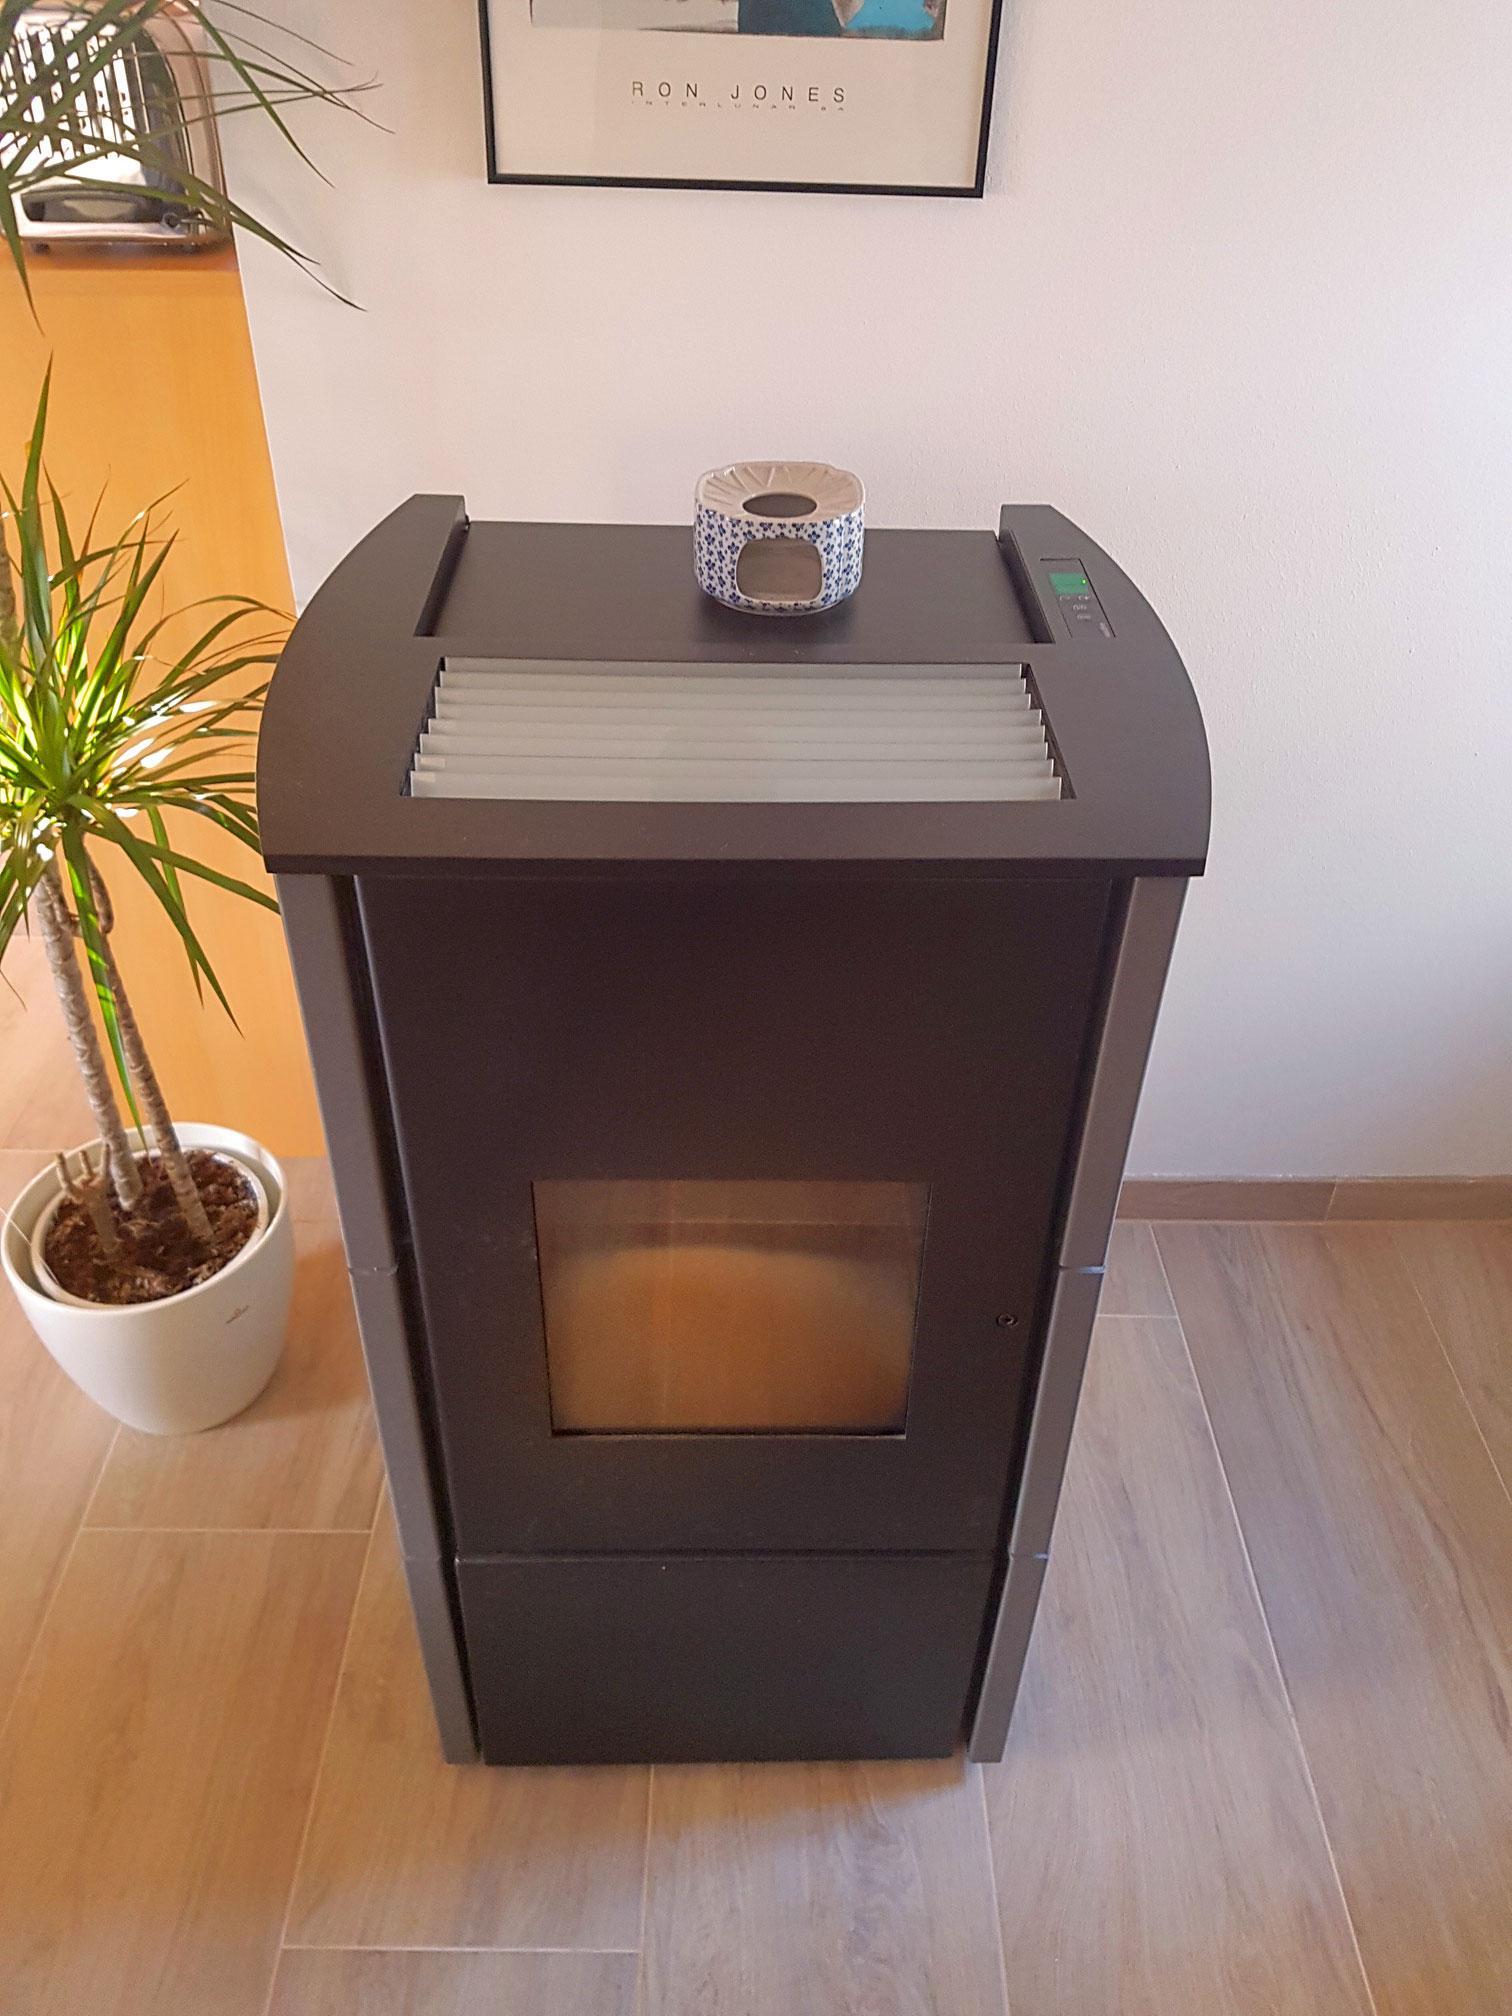 pellets prim rofen f r hohe kfw zusch sse haus. Black Bedroom Furniture Sets. Home Design Ideas